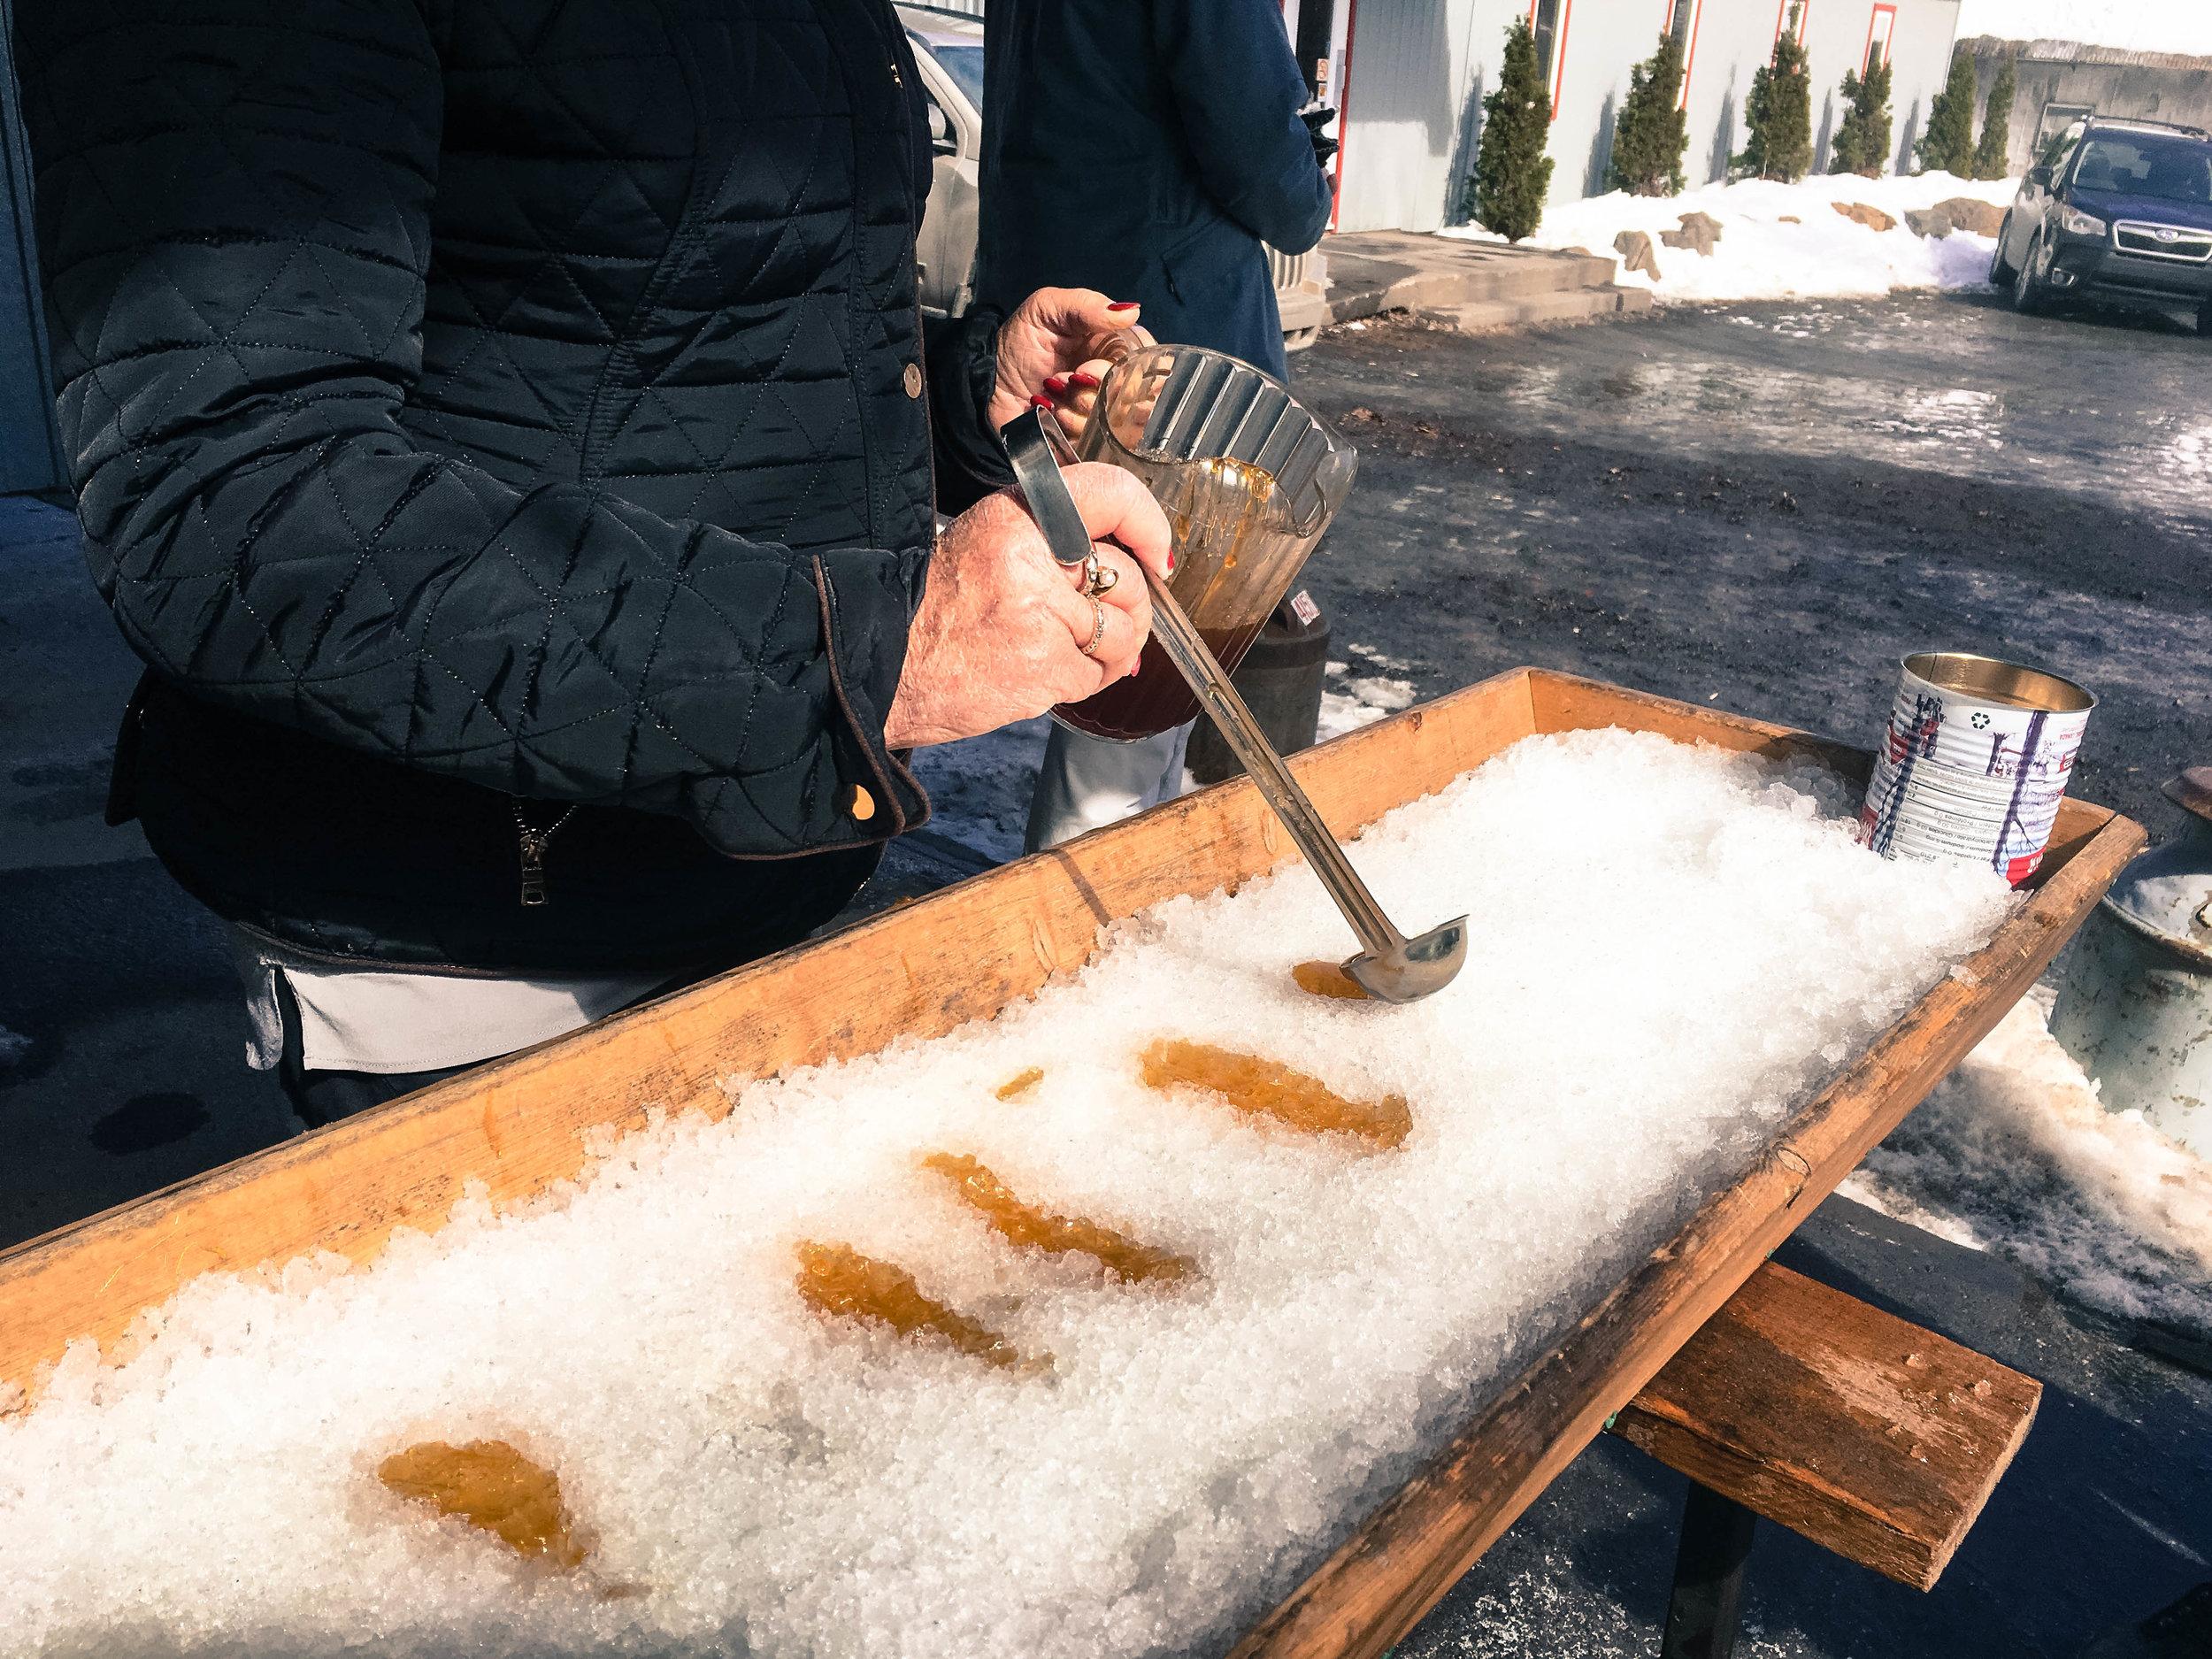 Maple taffy or Tire sur neige in a Cabane à sucre